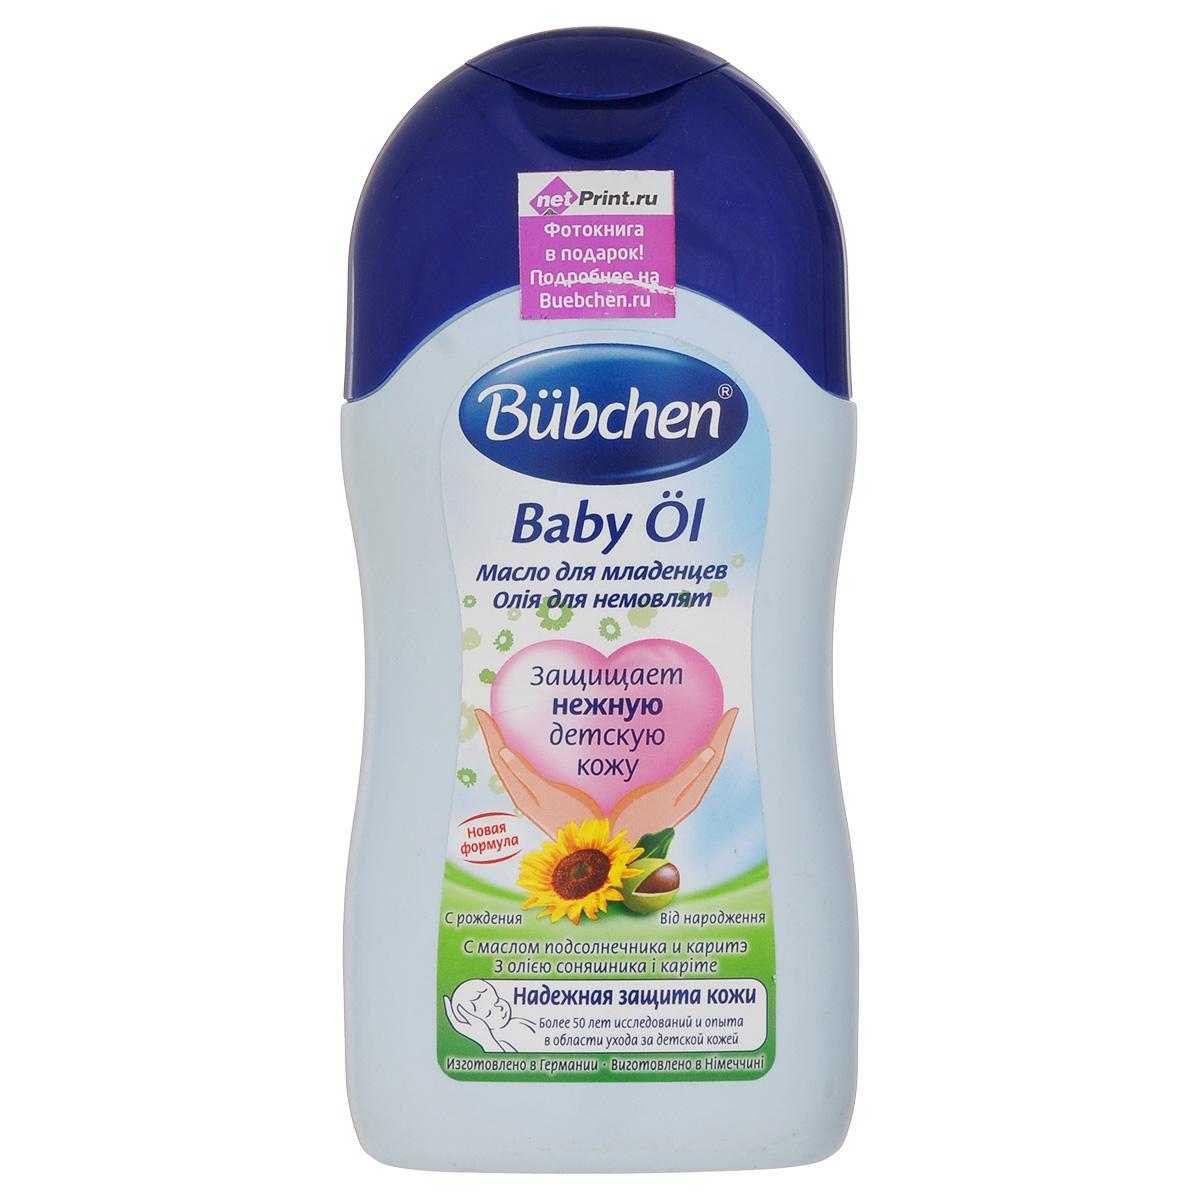 "Bubchen ����� ��� ����""Baby Ol"", � ������ ������ � �������������, 400 ��"